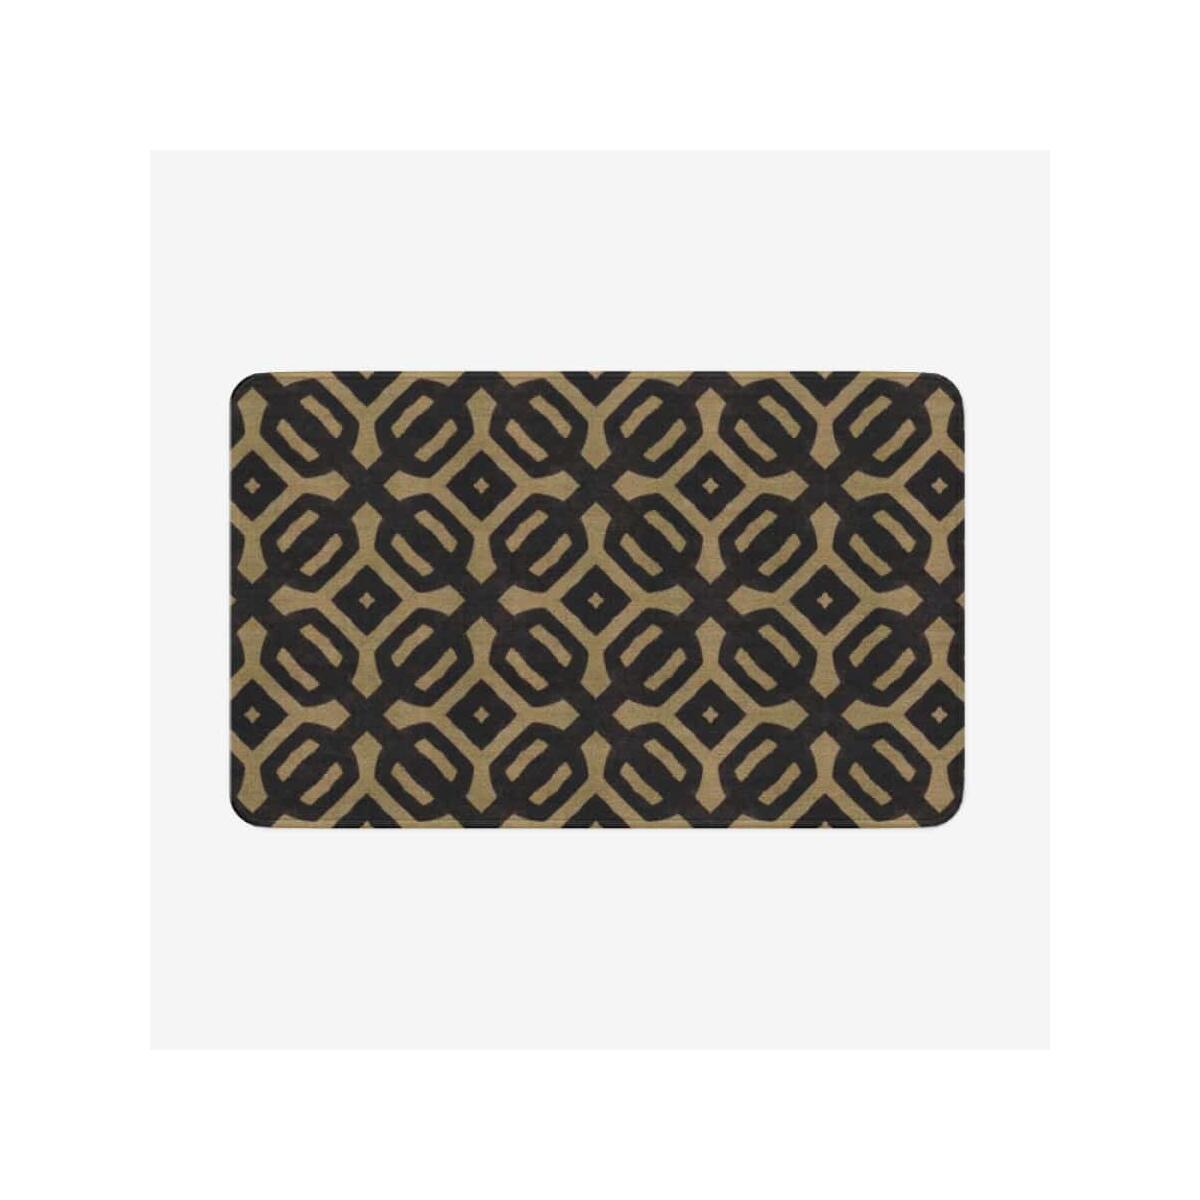 Brown Black Bogolan Microfiber Chevron Non-Slip Soft Kitchen Mat Bath Rug Doormat, 18'' x 30''